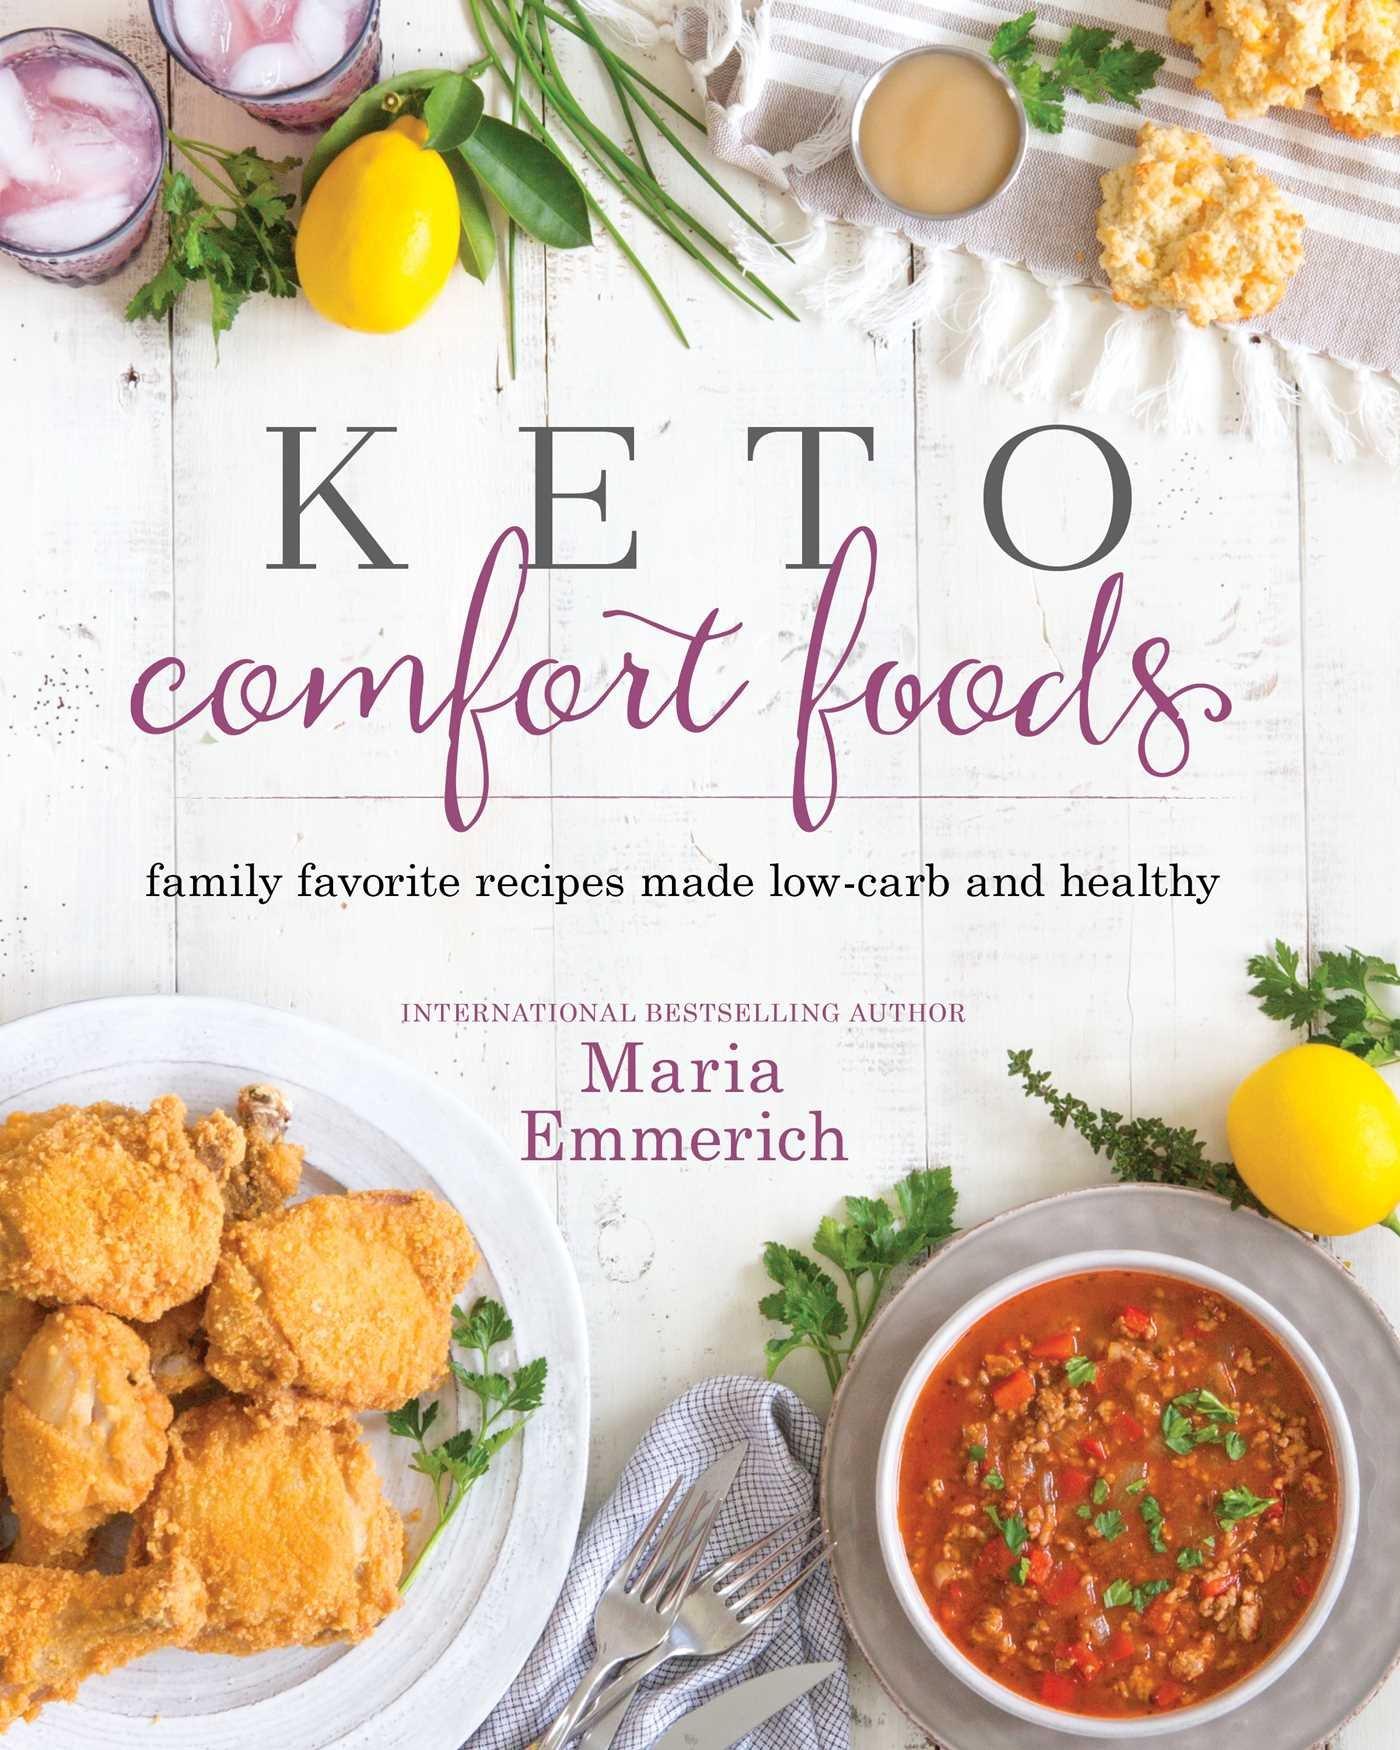 Keto Cookbooks - Keto Comfort Foods Maria Emmerich Cookbook